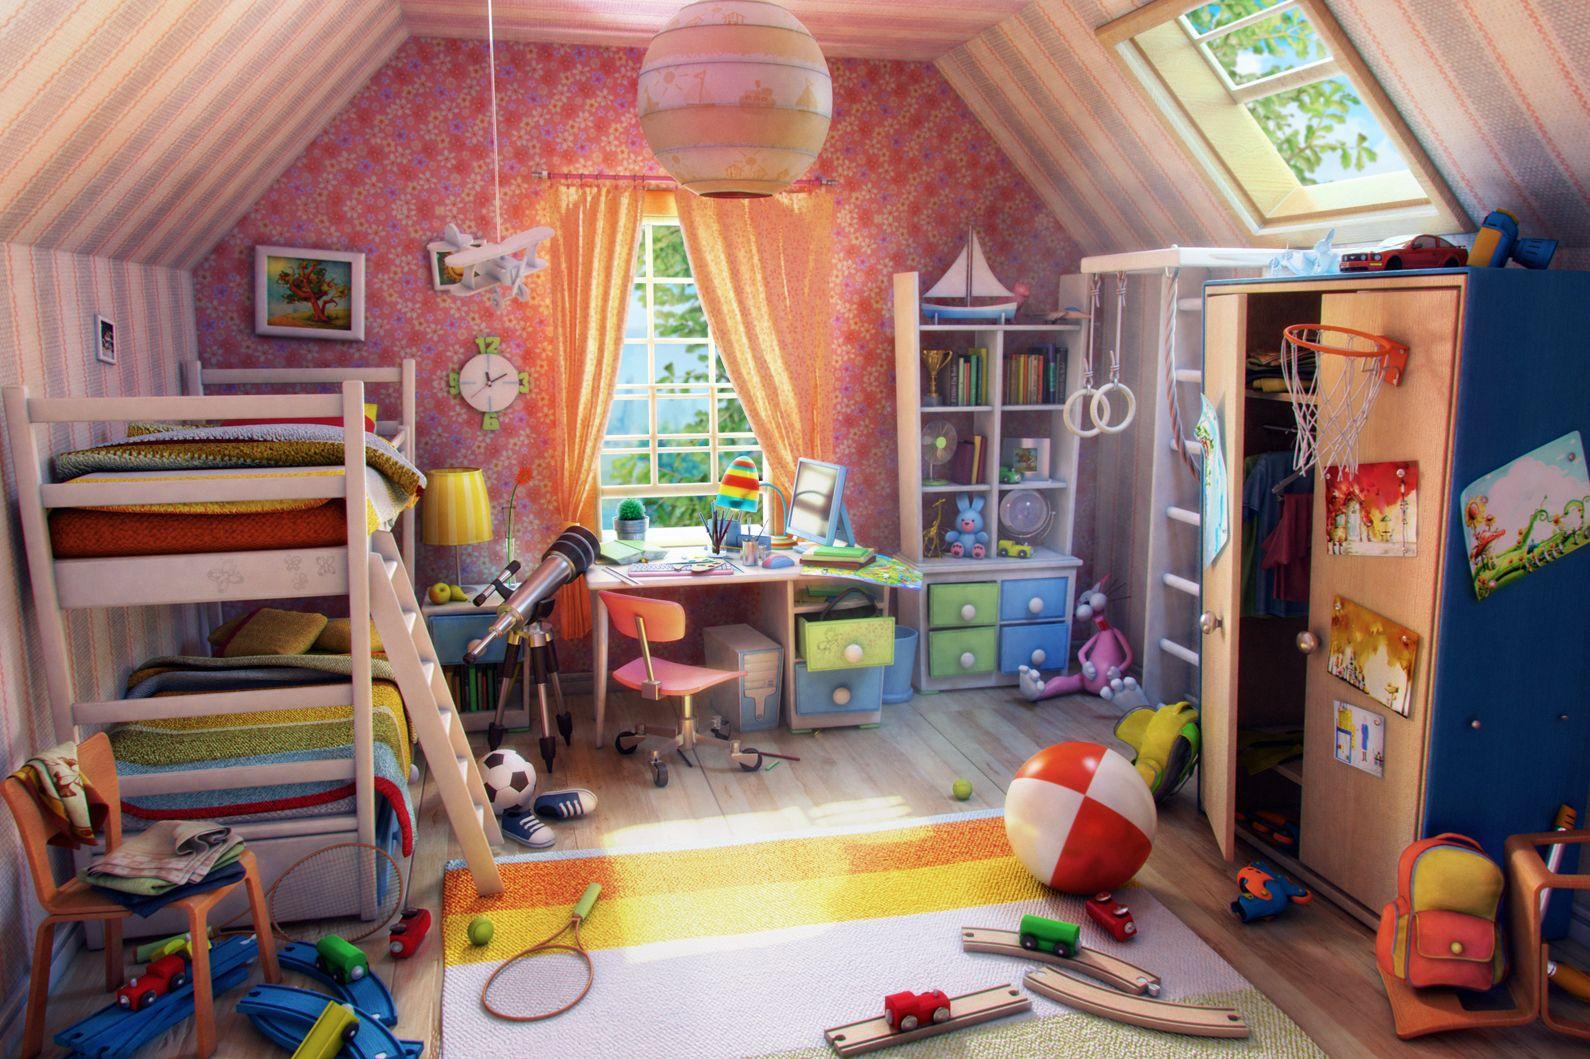 Cartoon Room: Childrens Room Picture (3d, Illustration, Interior